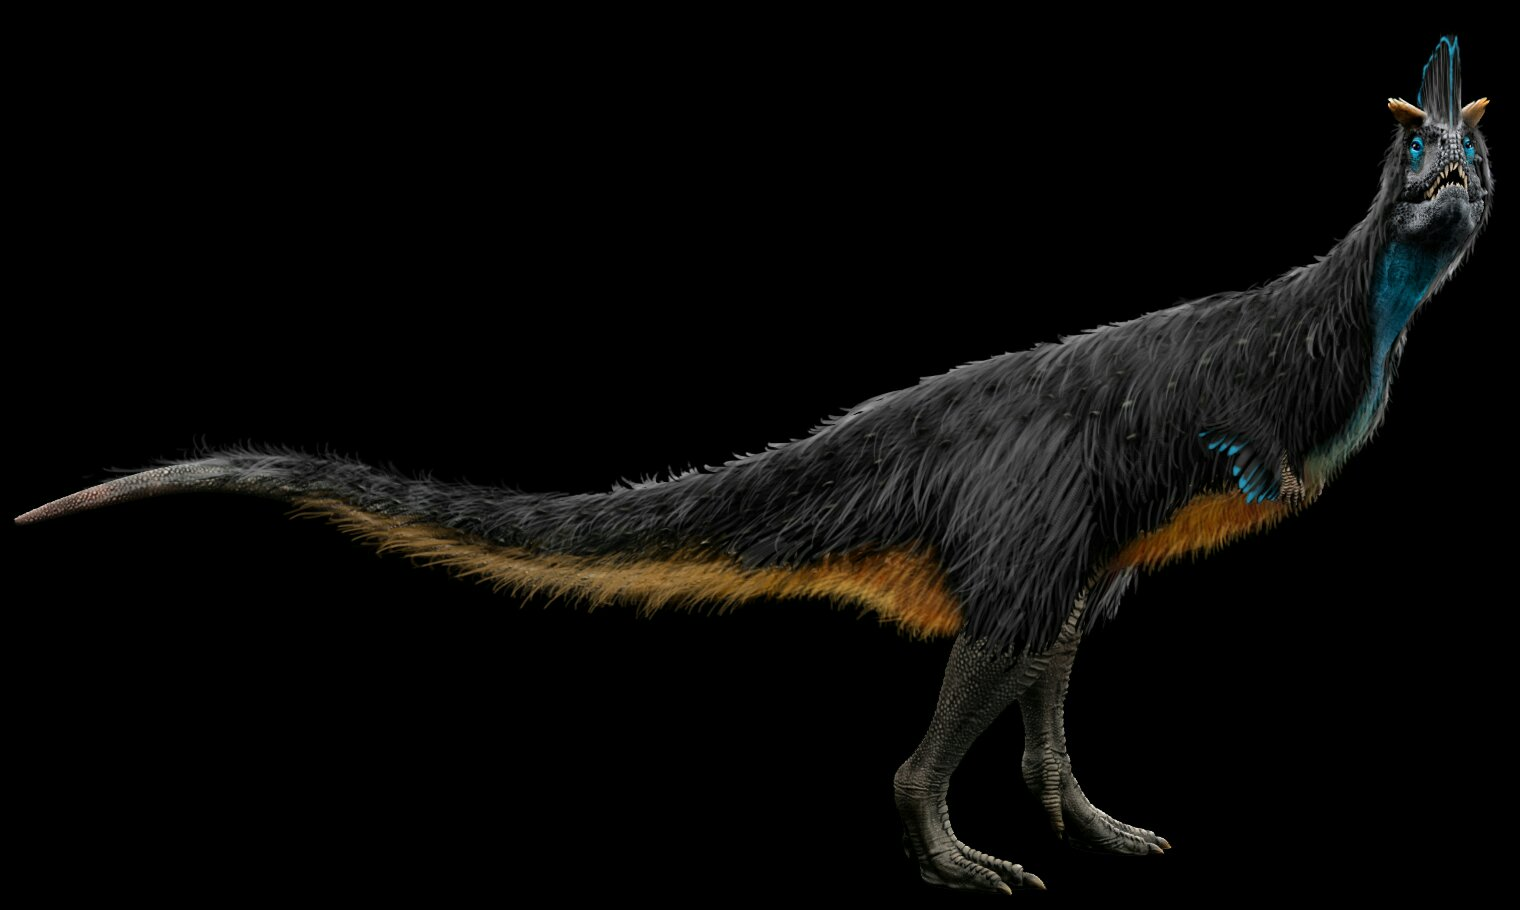 Avitabelisaurus